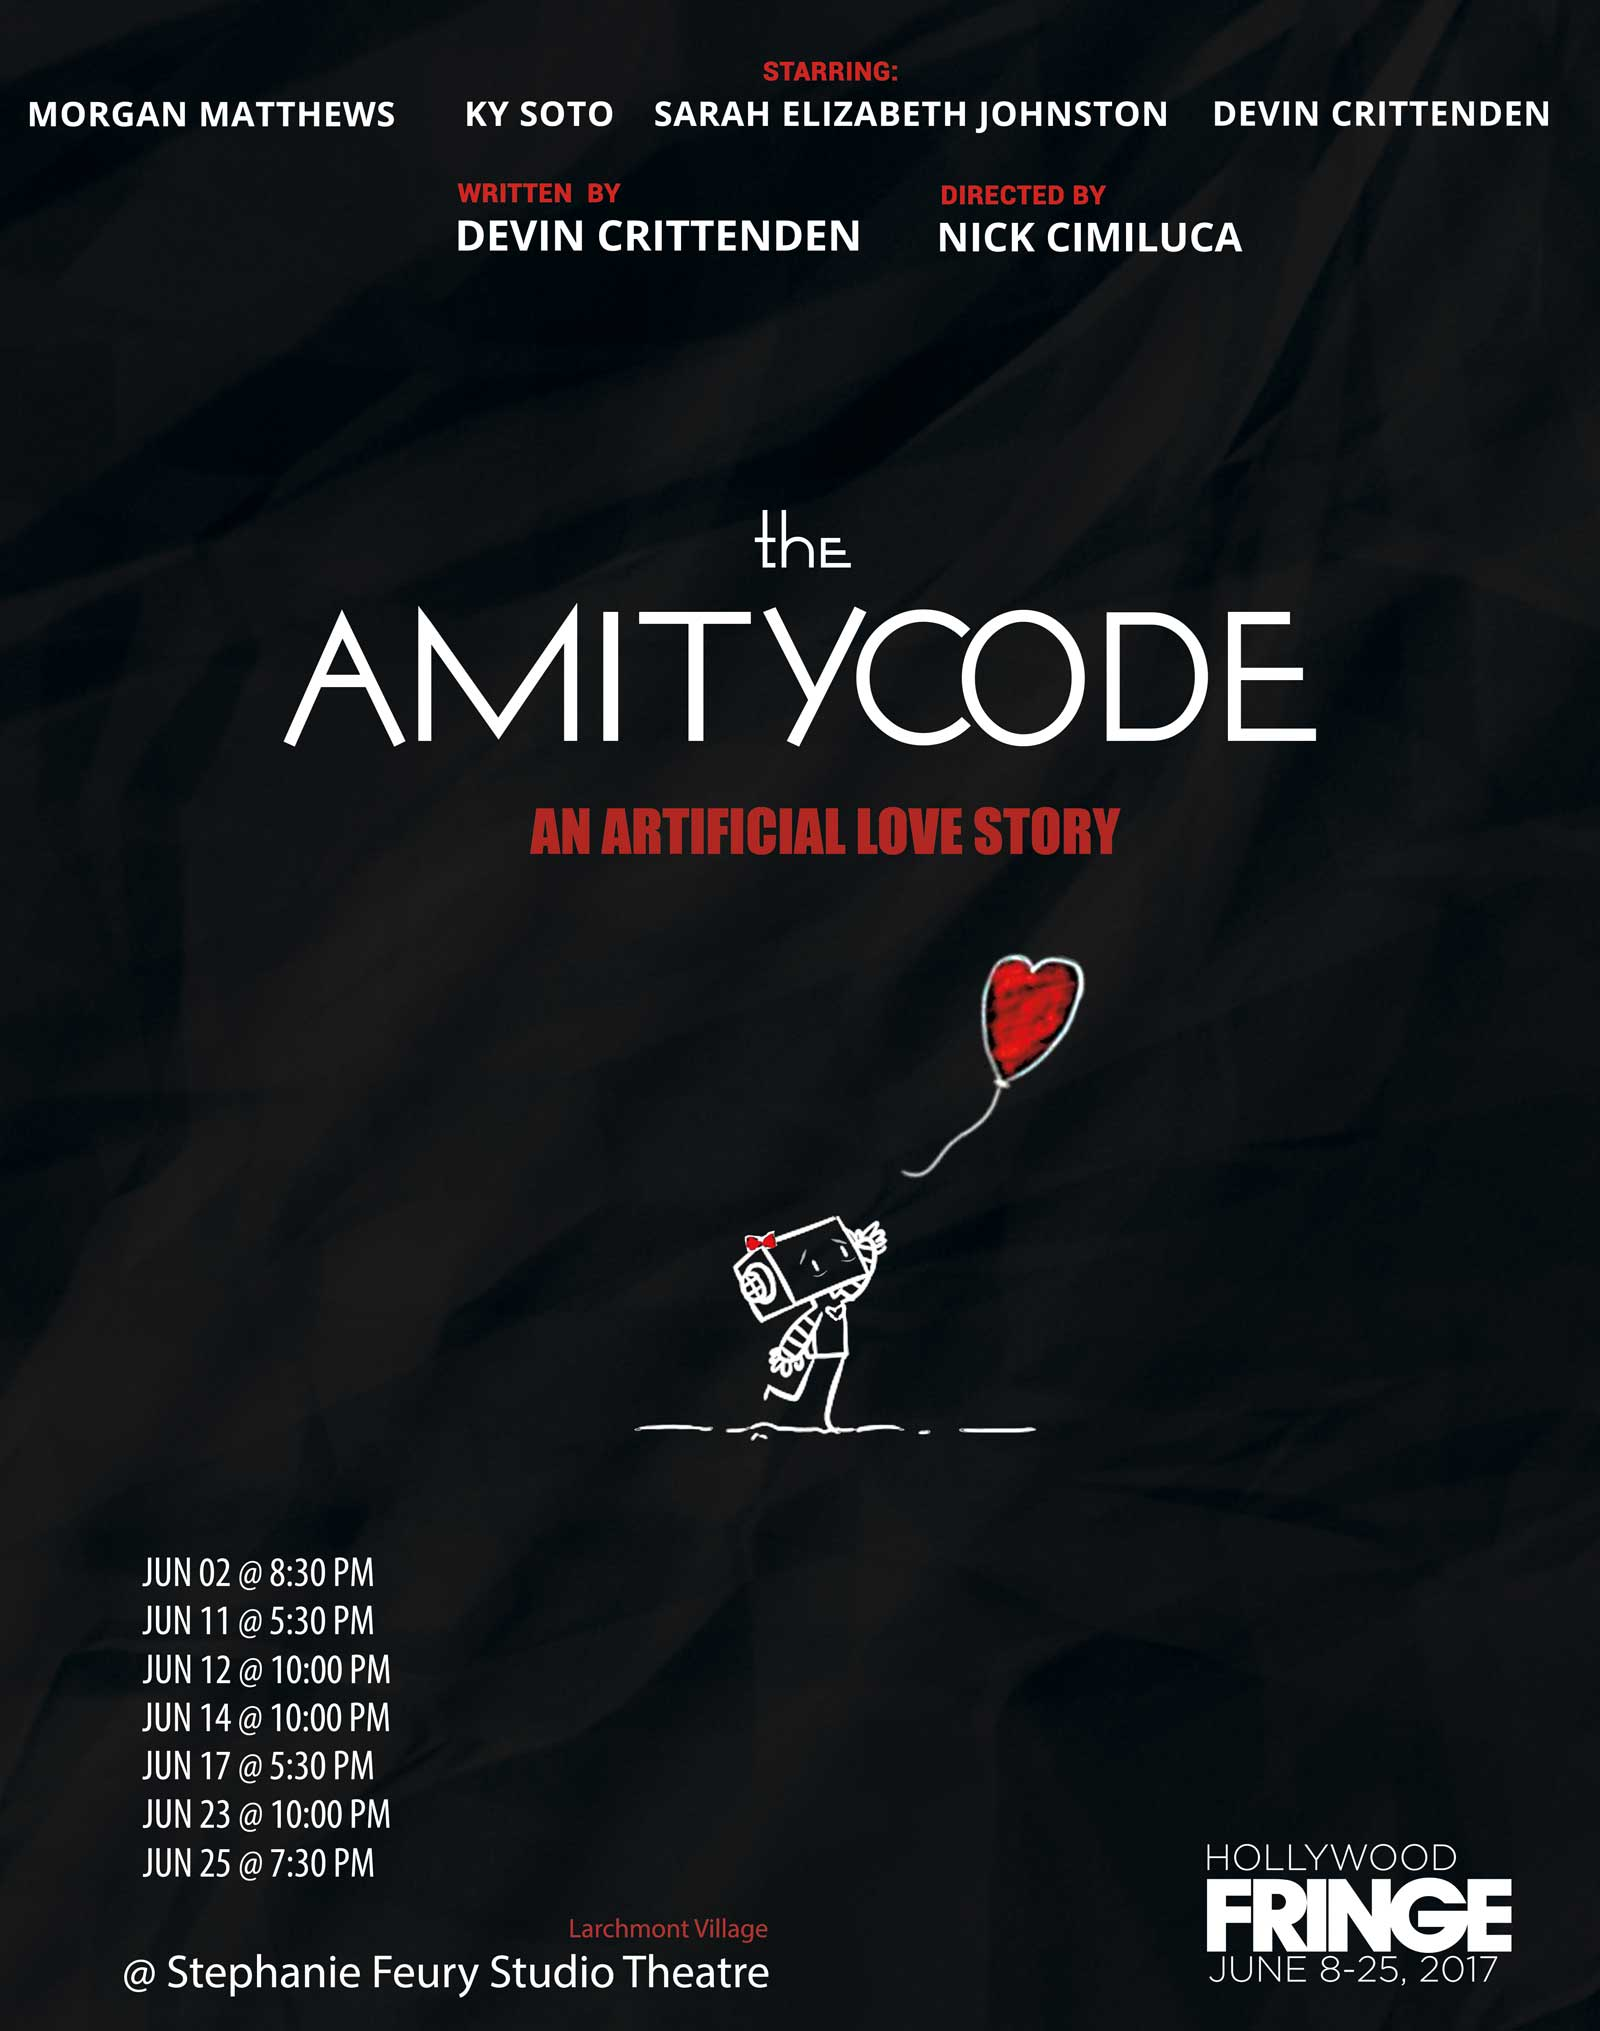 the AMITYCODE